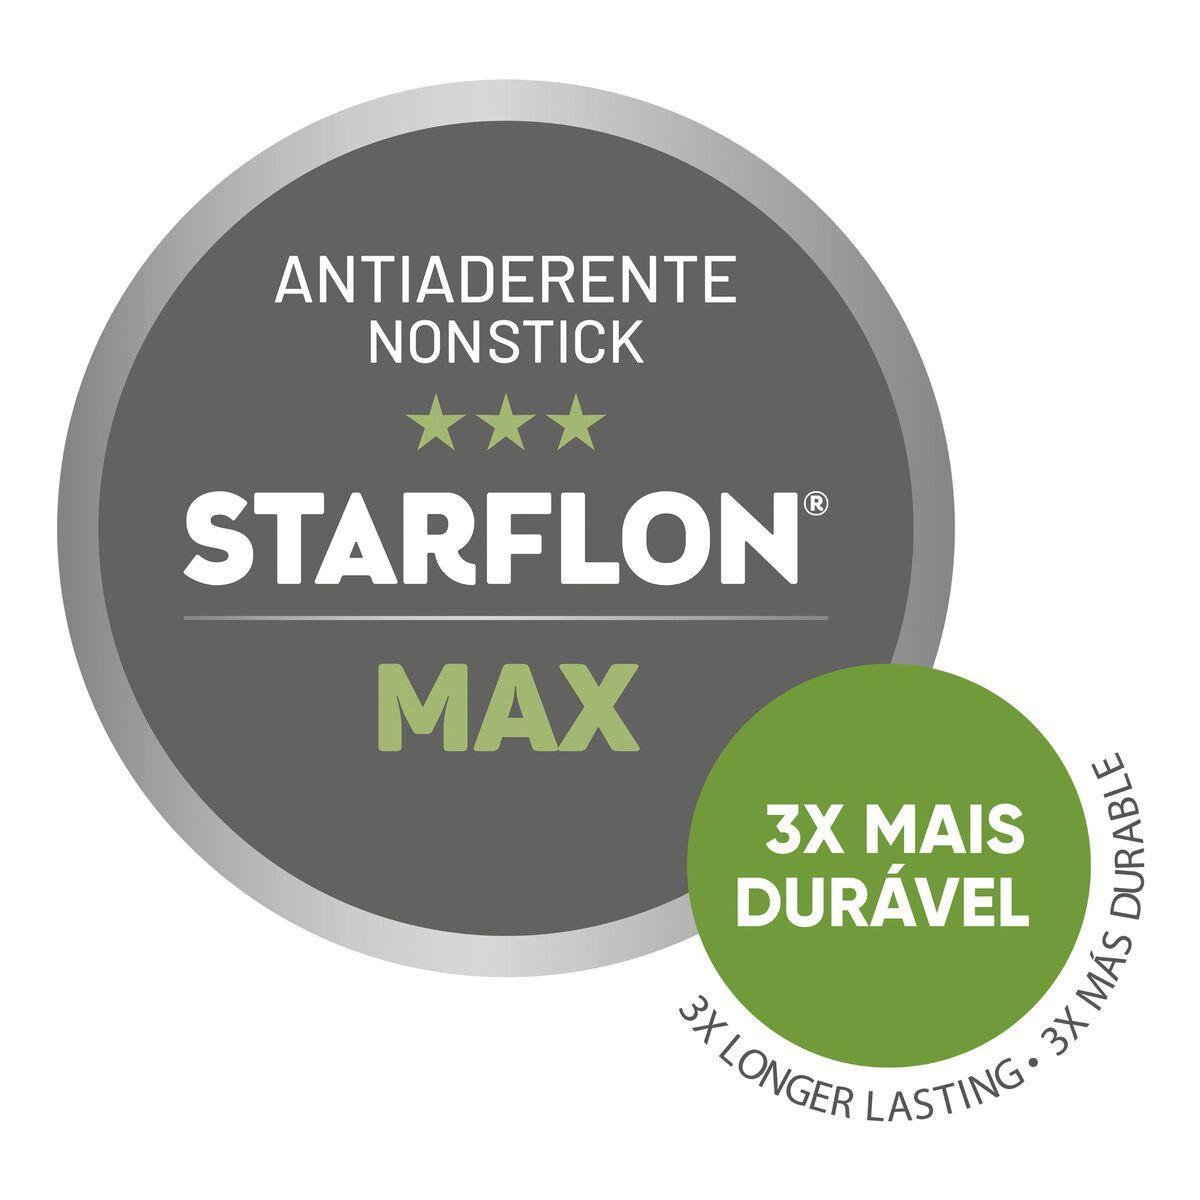 Jogo de Panelas Tramontina 5 Peças Paris Texture em Alumínio Antiaderente Starflon Max Vermelho